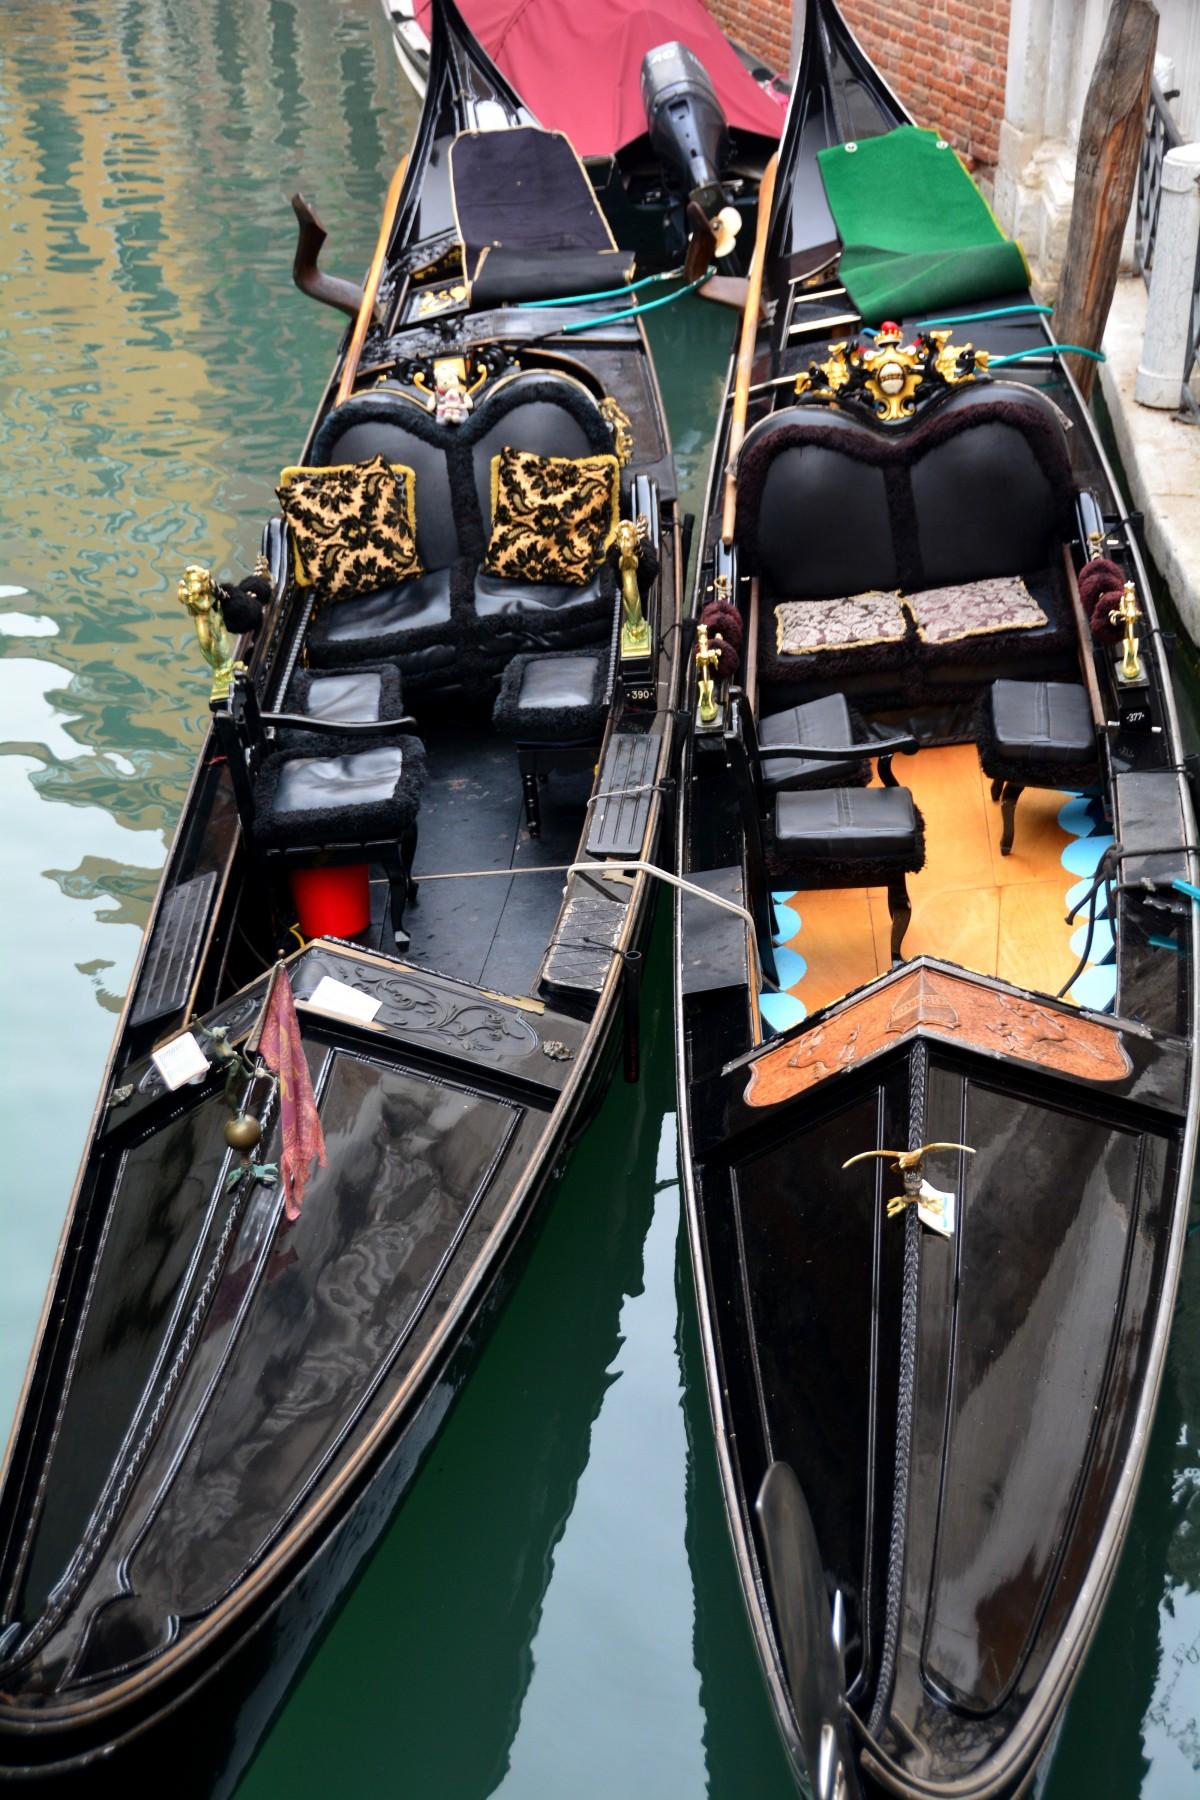 лодка это транспорт или средство передвижения